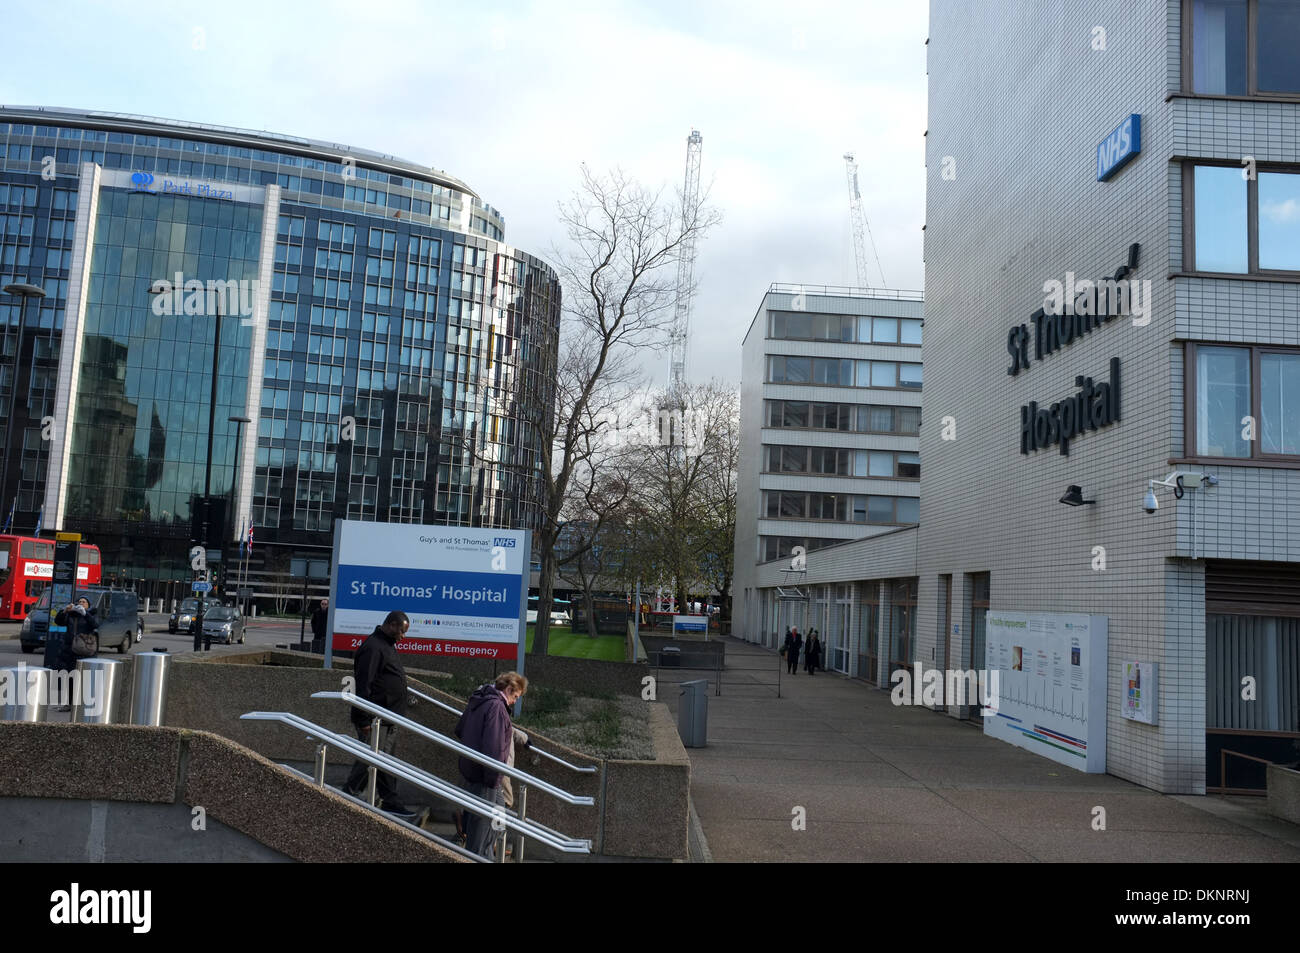 st thomas' nhs teaching hospital lambeth central london uk 2013 - Stock Image